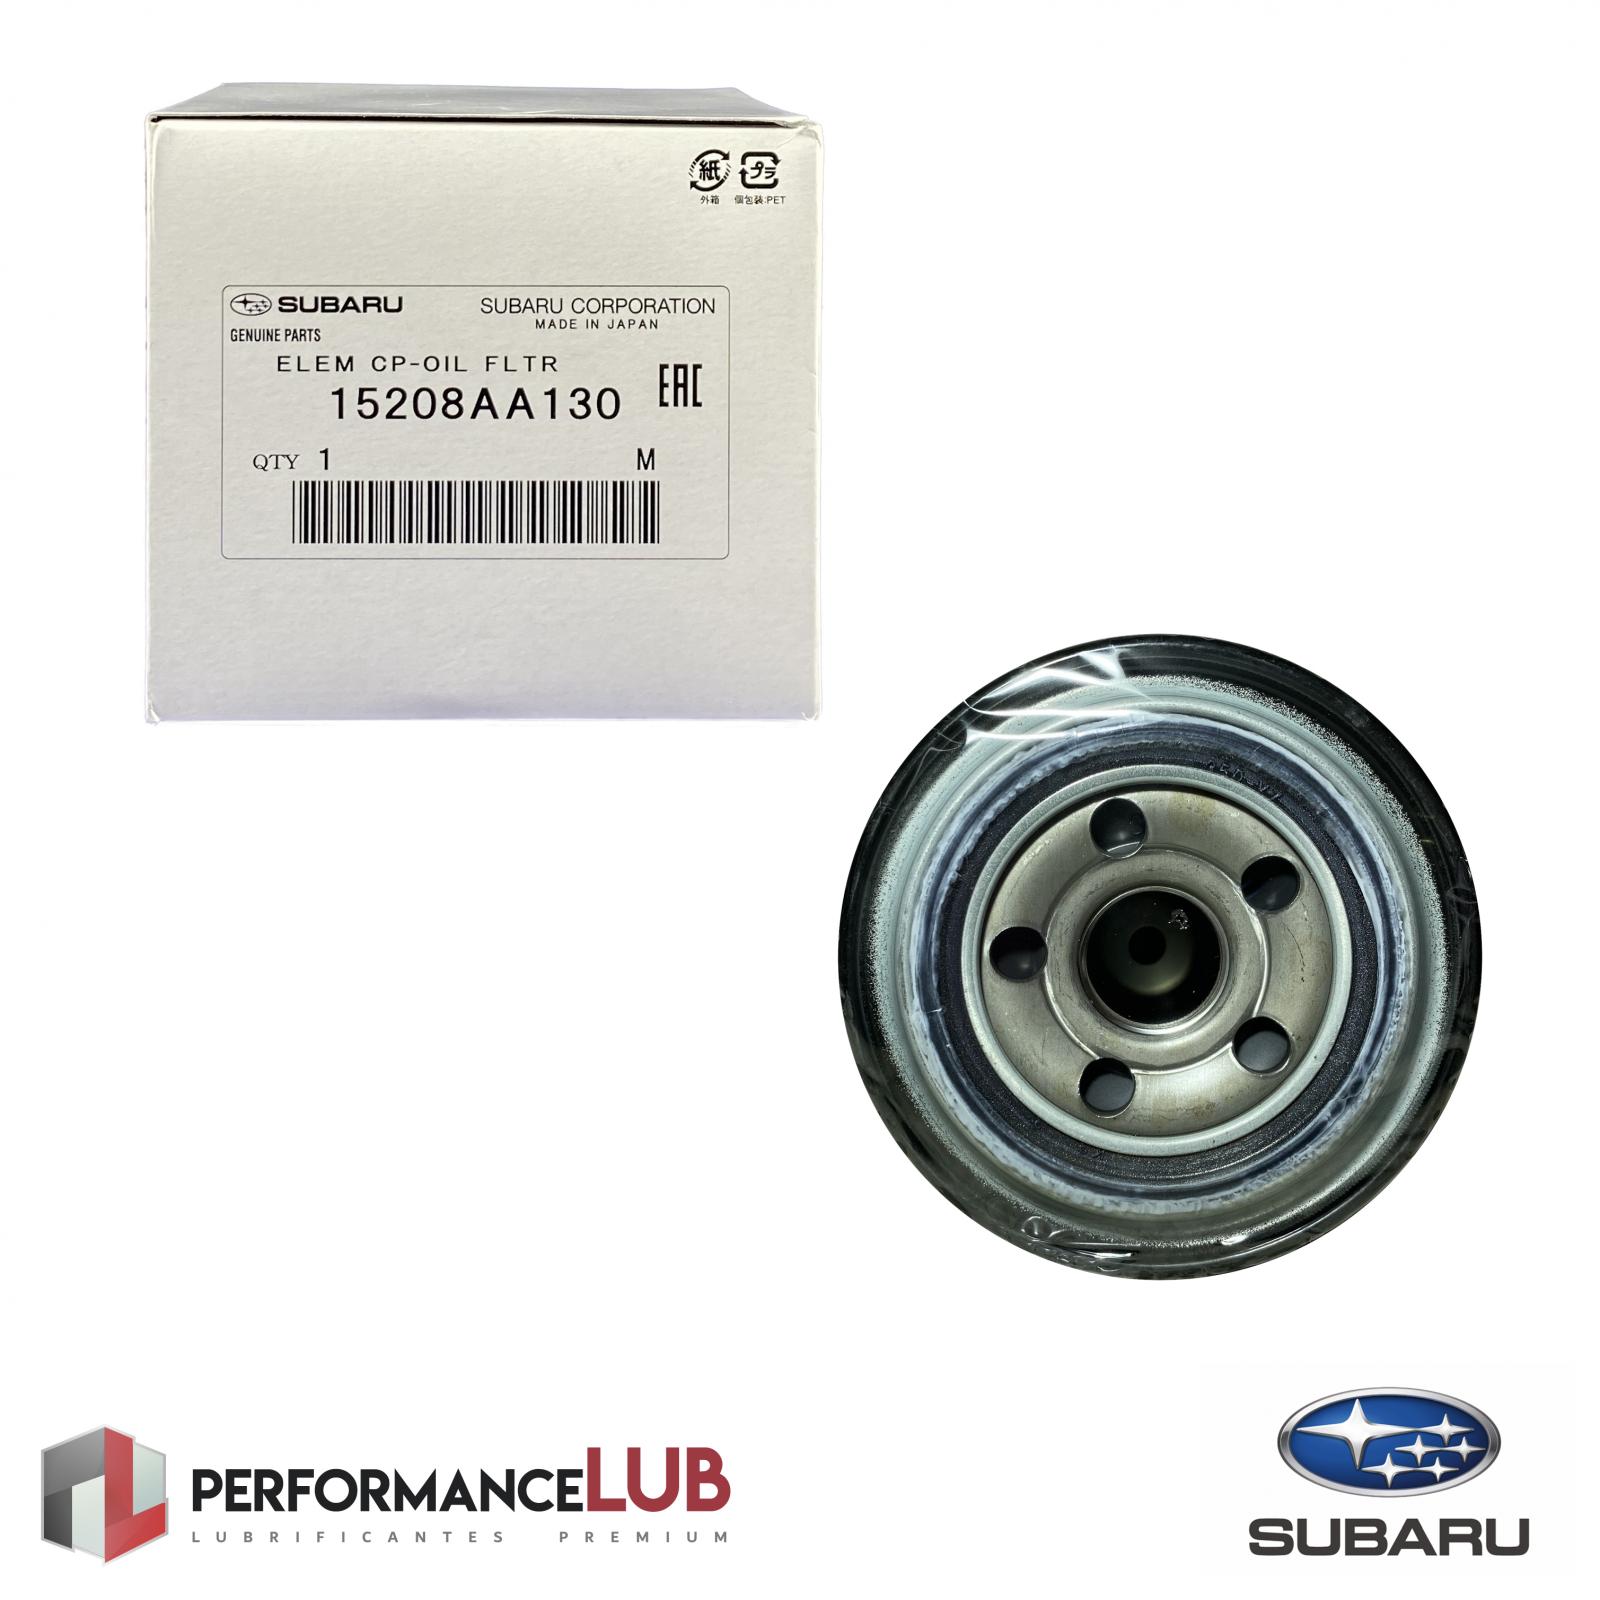 Filtro de óleo do motor - Subaru - 15208AA130 - PerformanceLUB Lubrificantes Premium